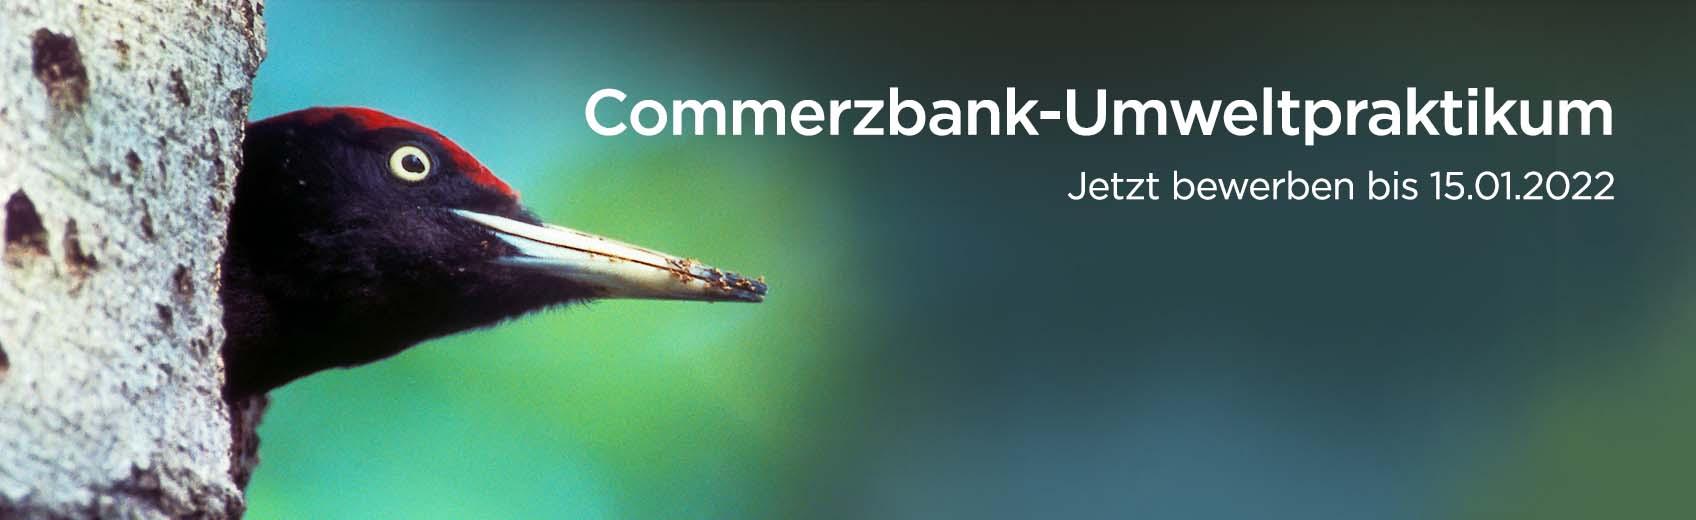 Banner Umweltpraktikum 2022